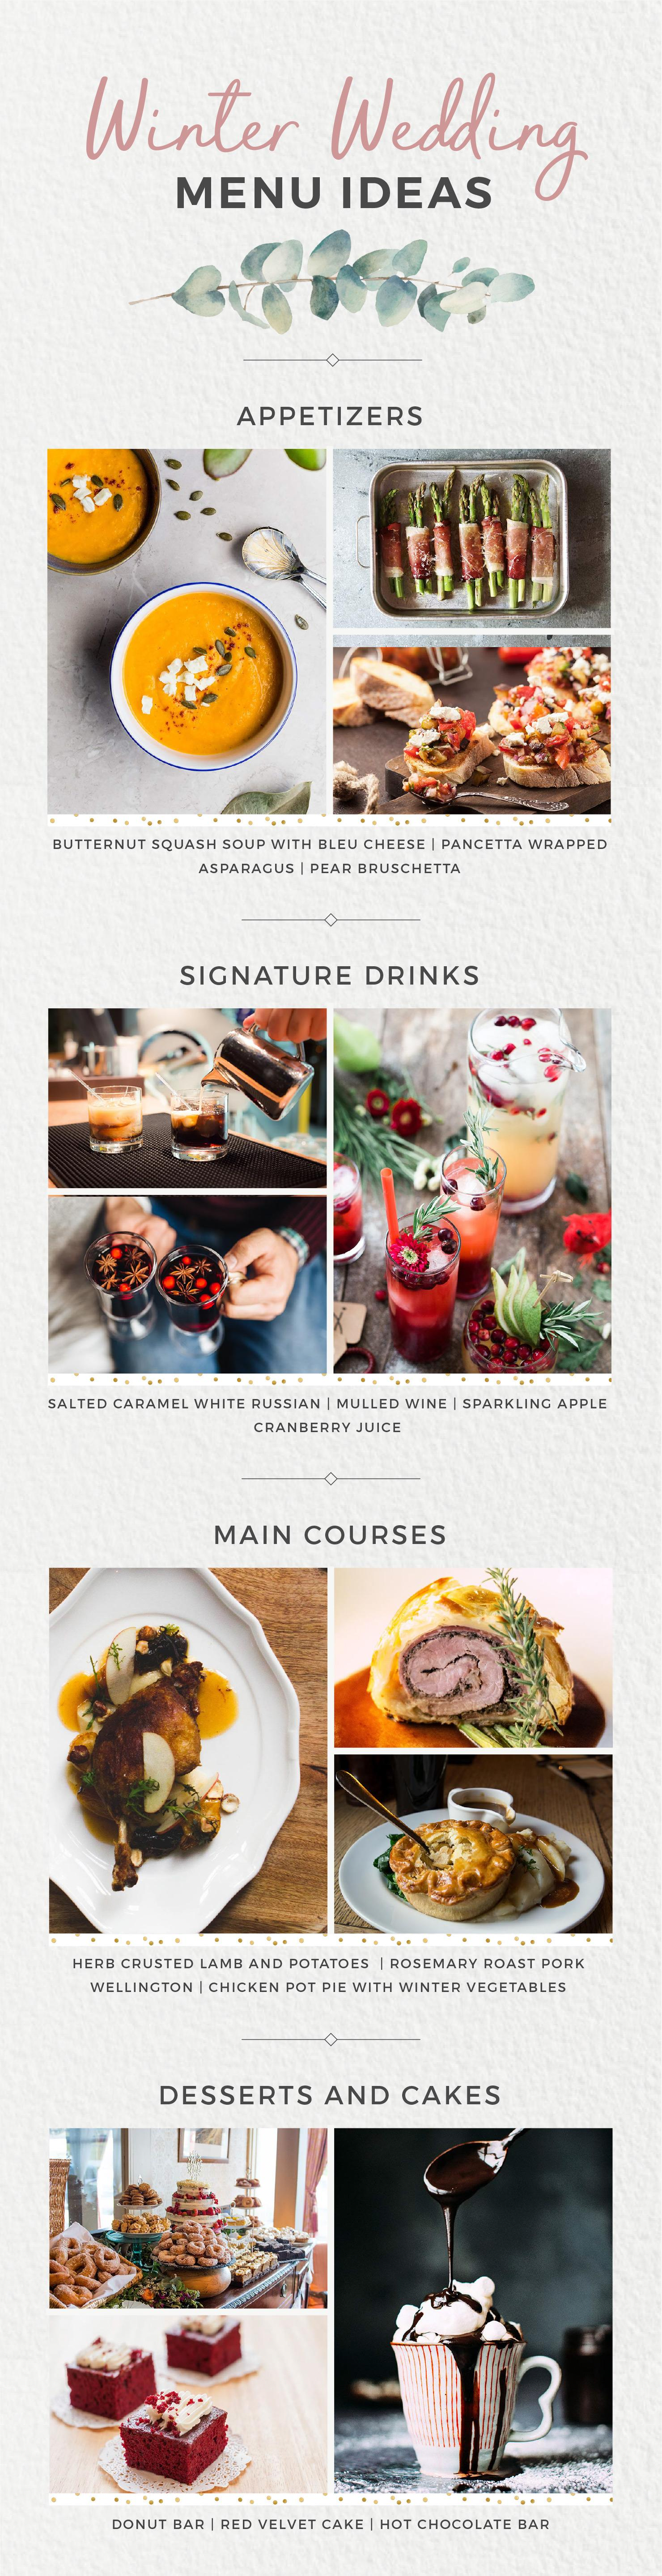 Wedding Menu Ideas for Every Season Winter Wedding Food Shutterfly Philly In Love Philadelphia Weddings